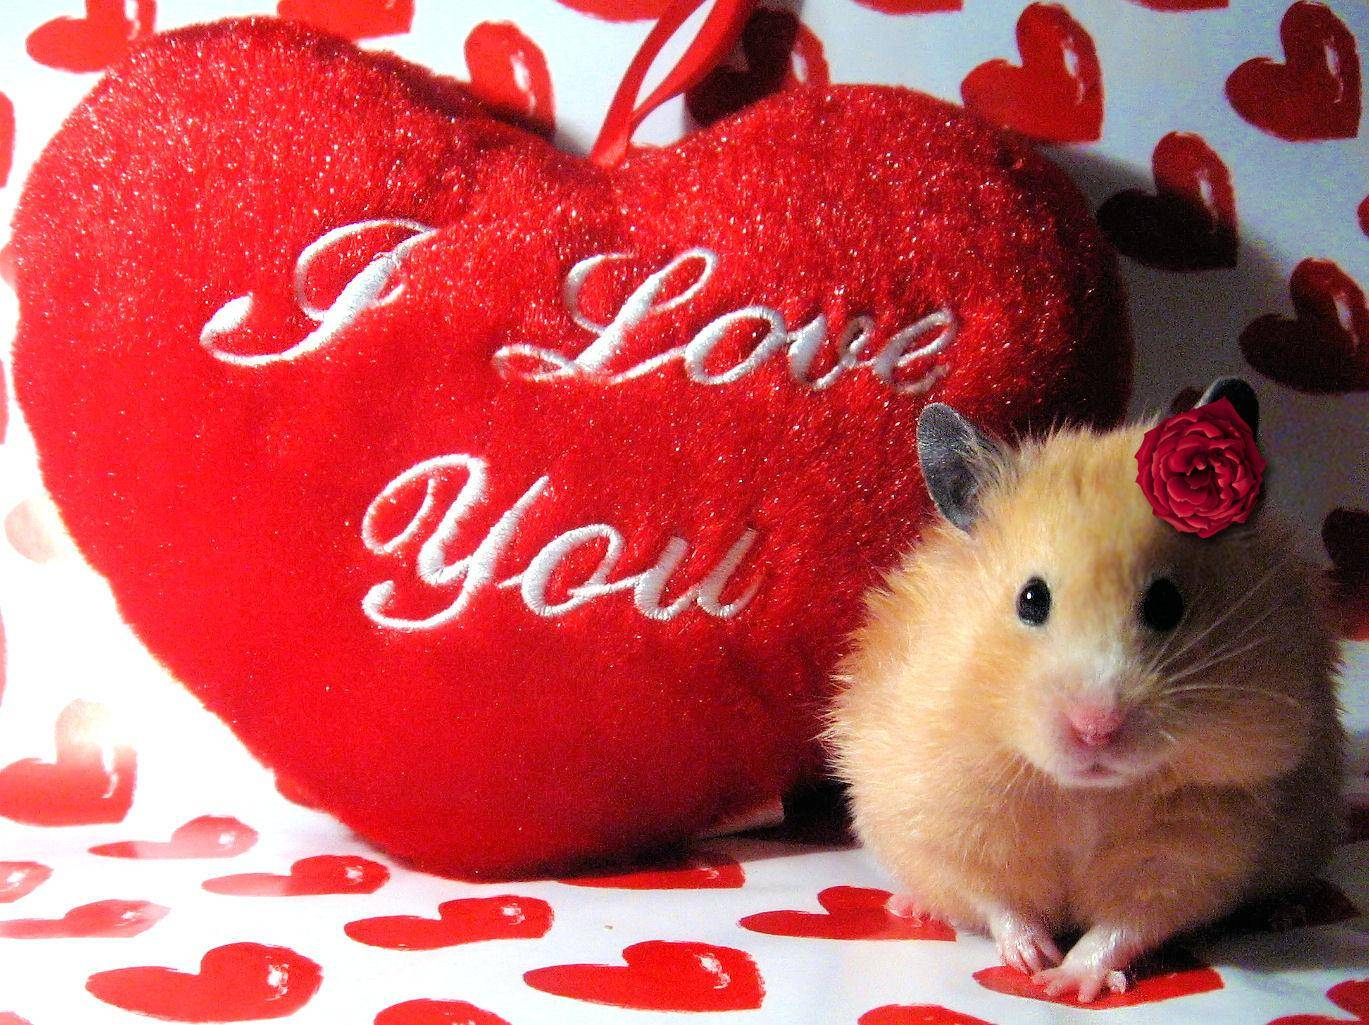 cute hamster wallpaper   Hamsters Wallpaper 1369x1025